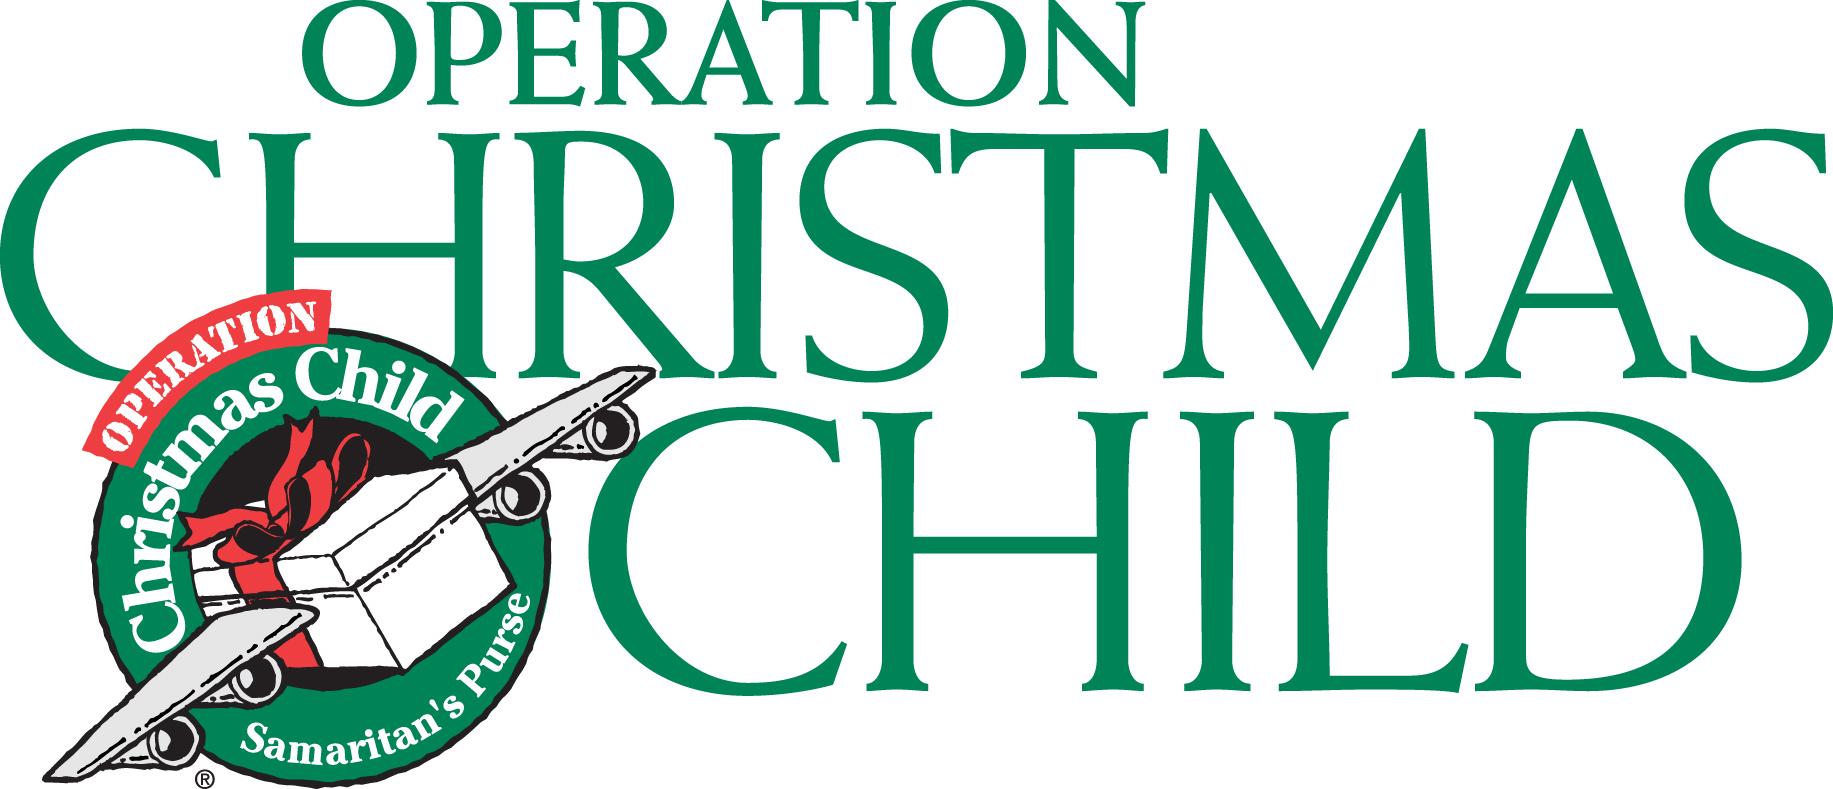 Monte Vista Christian School Operation Christmas Child.